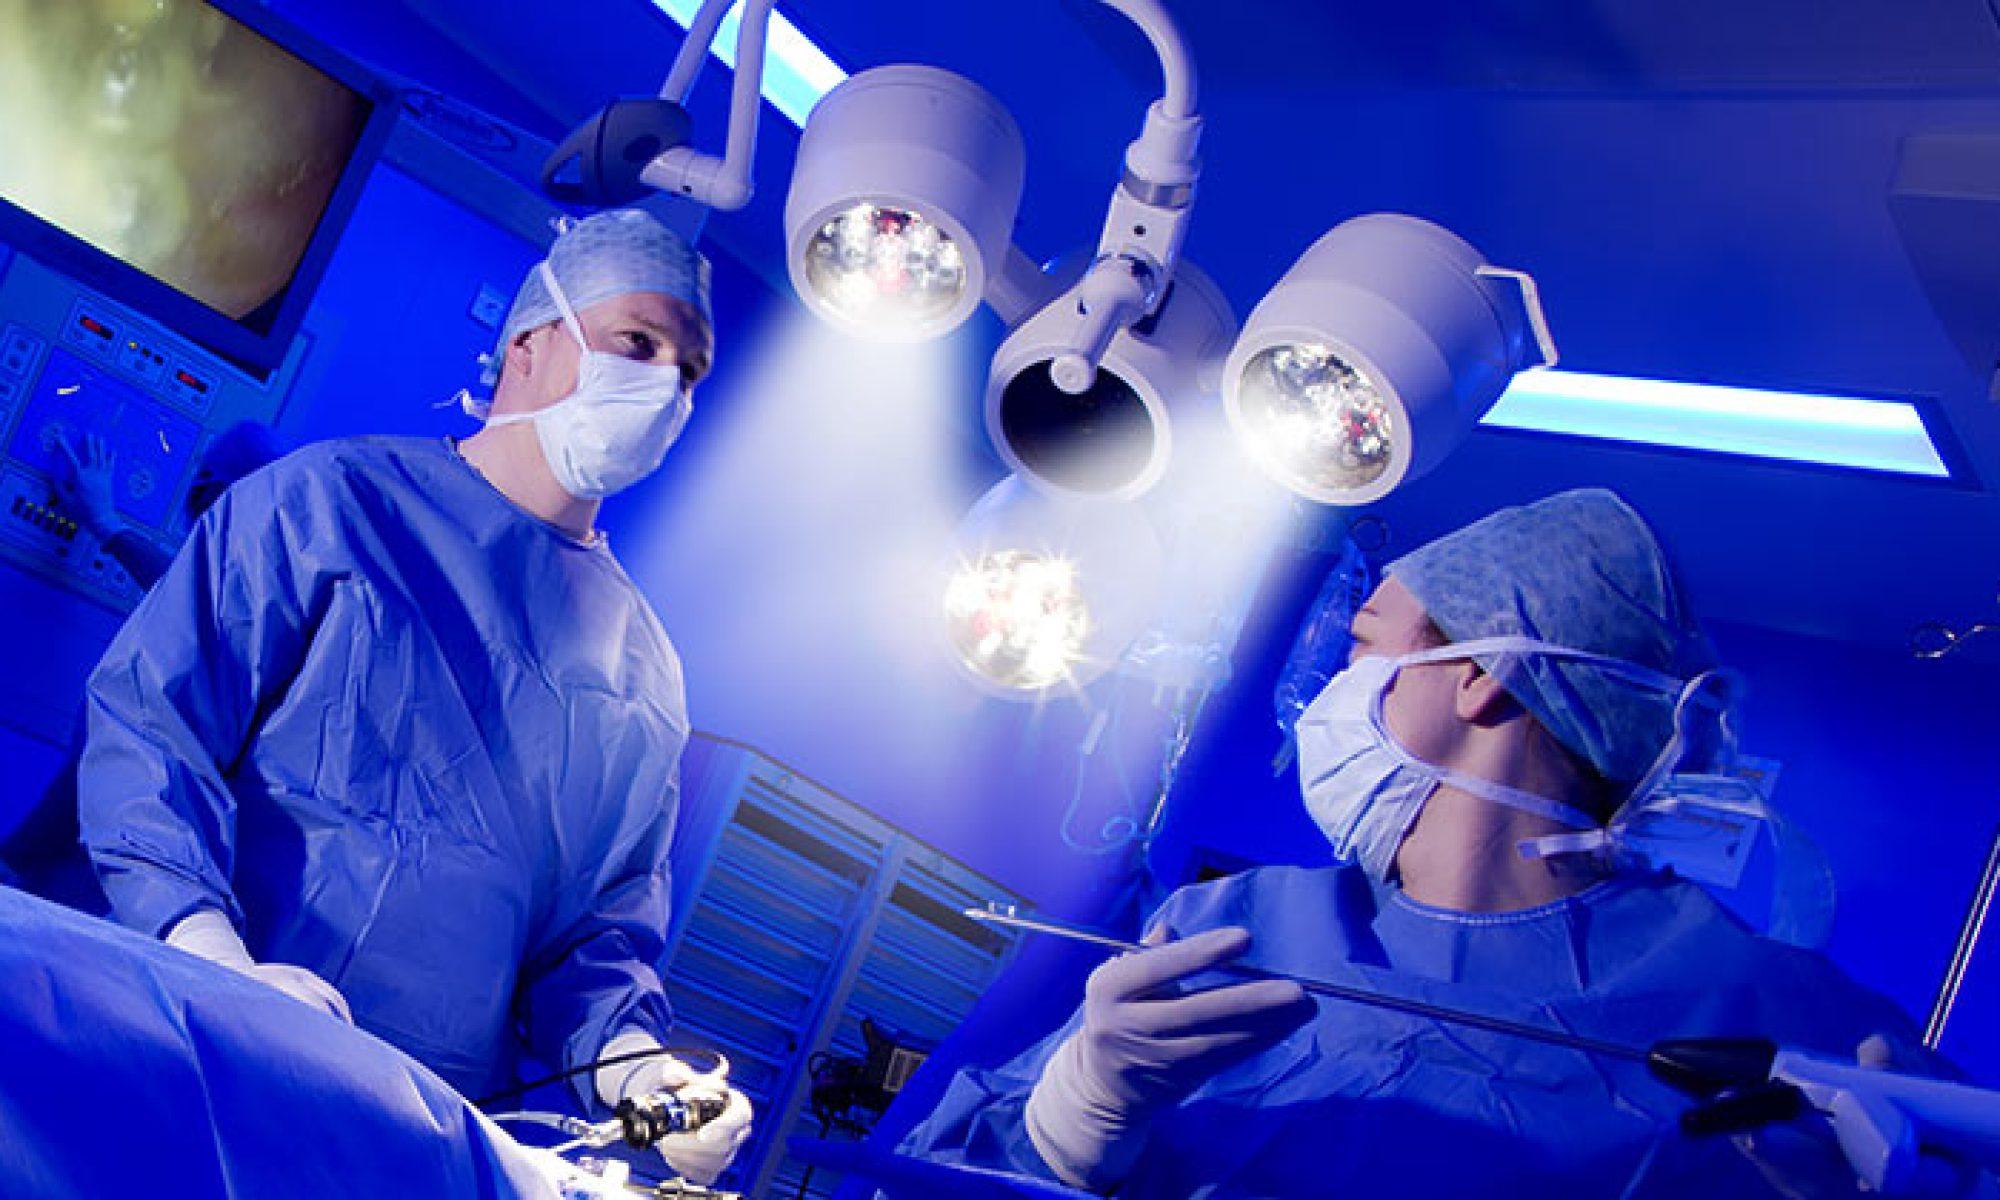 International standards for the best medical